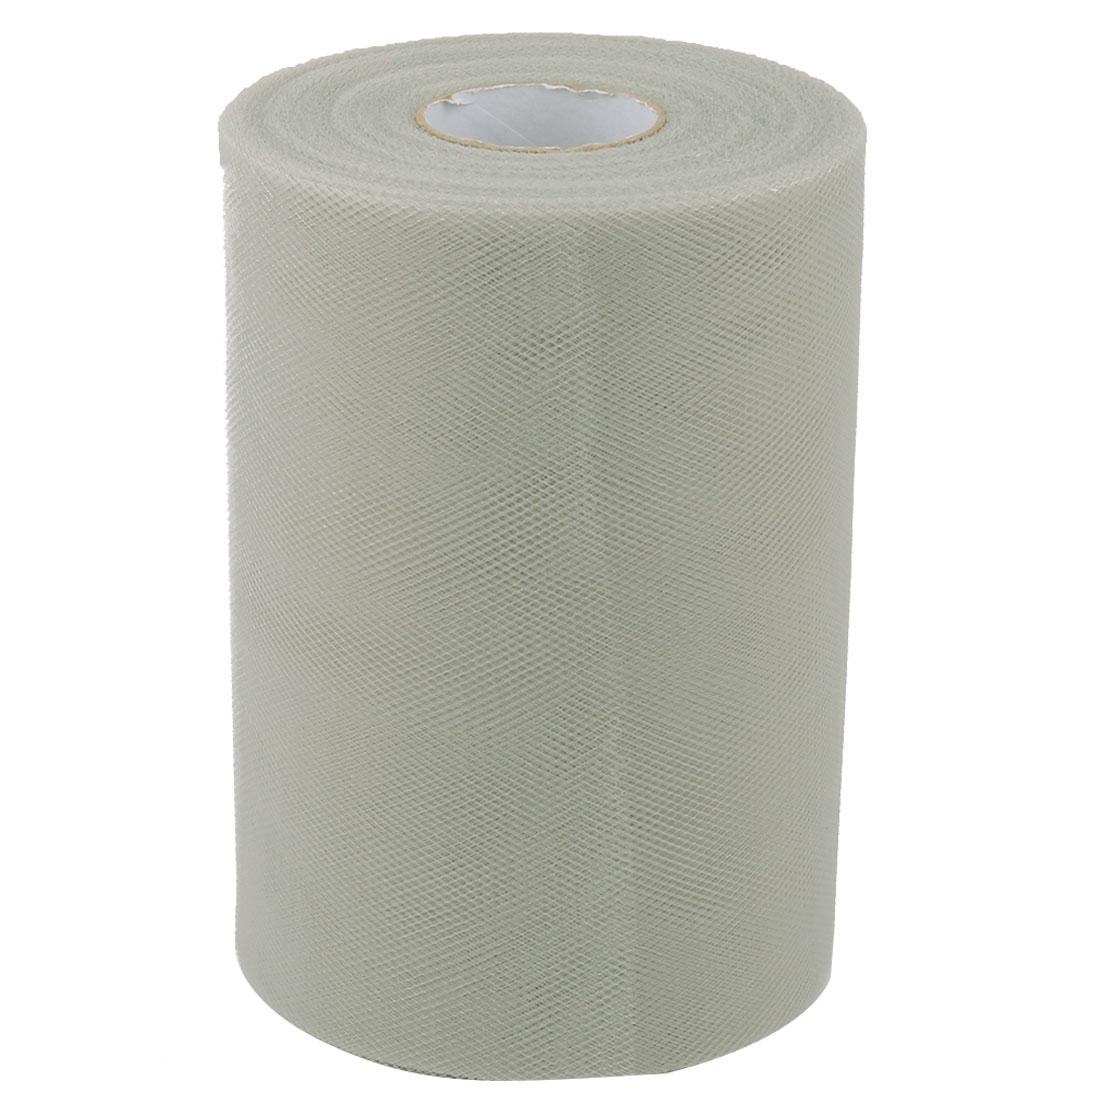 Family Tutu Gift Decor Craft Tulle Spool Roll Light Gray 6 Inch x 100 Yards